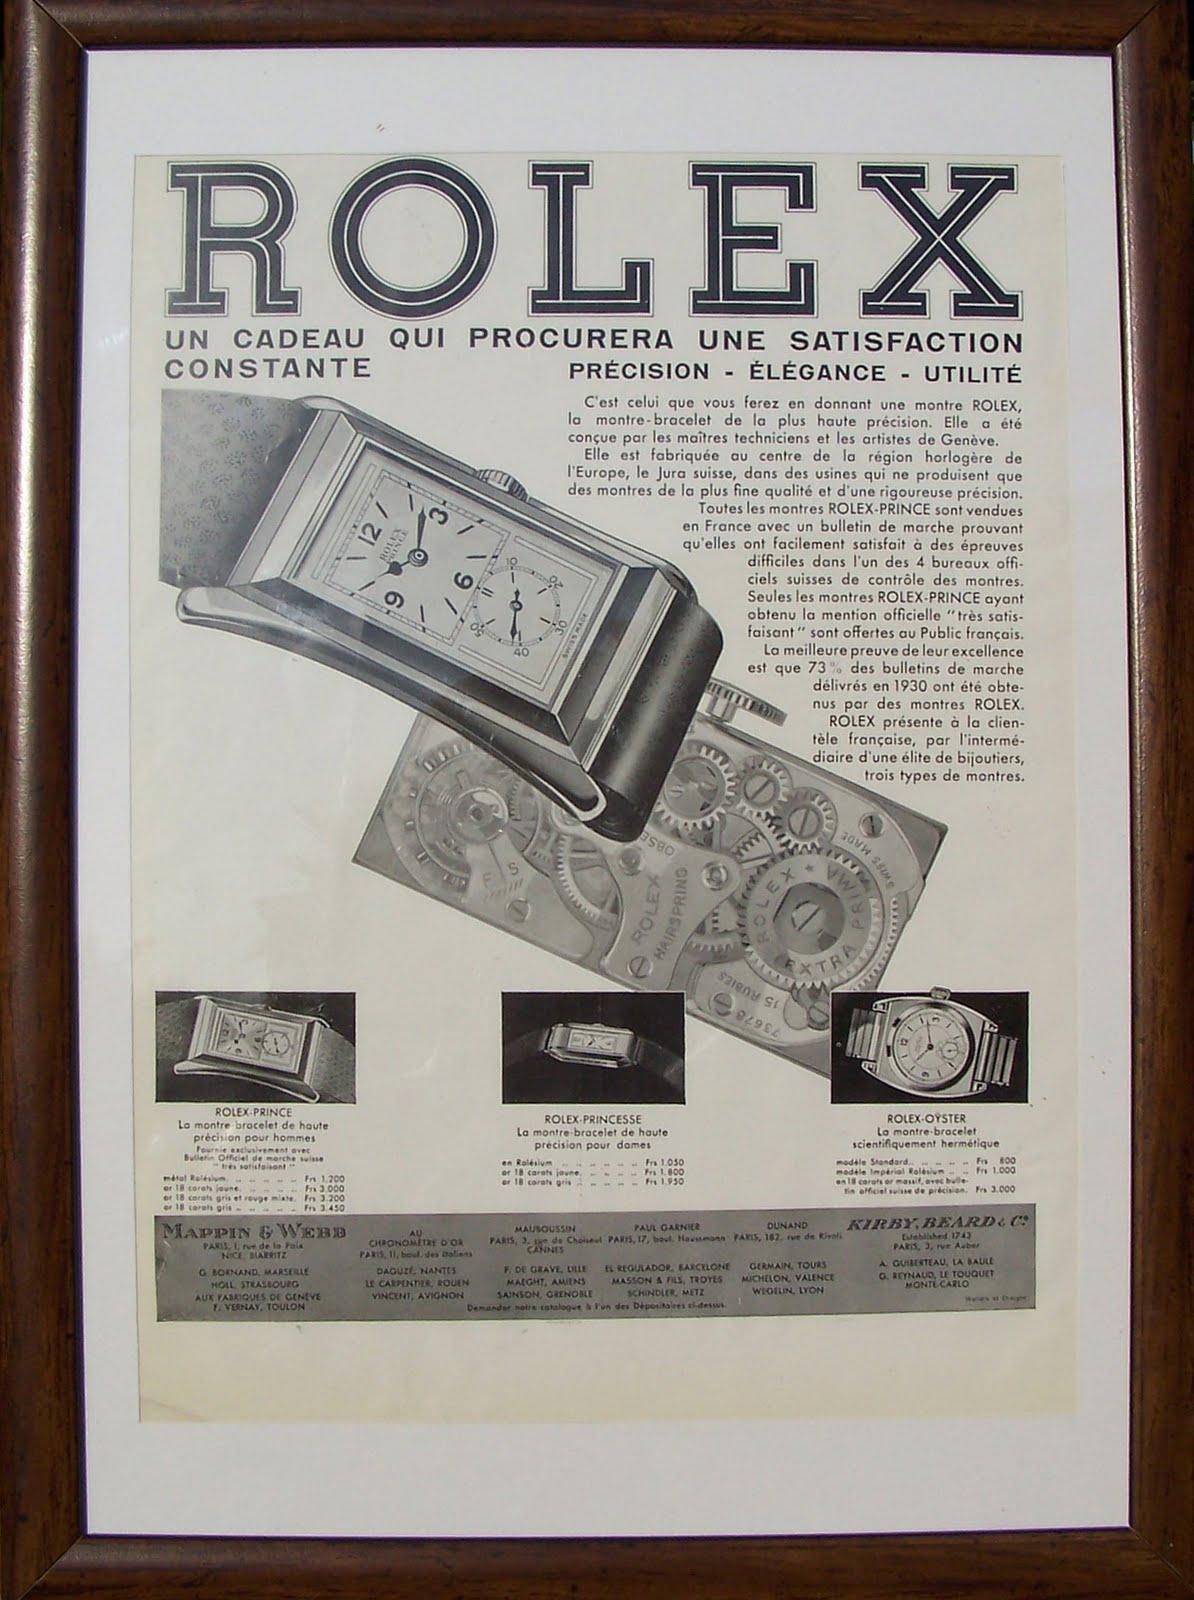 rolex encyclopedia  u00bb rolex prince  the doctor u2019s watch